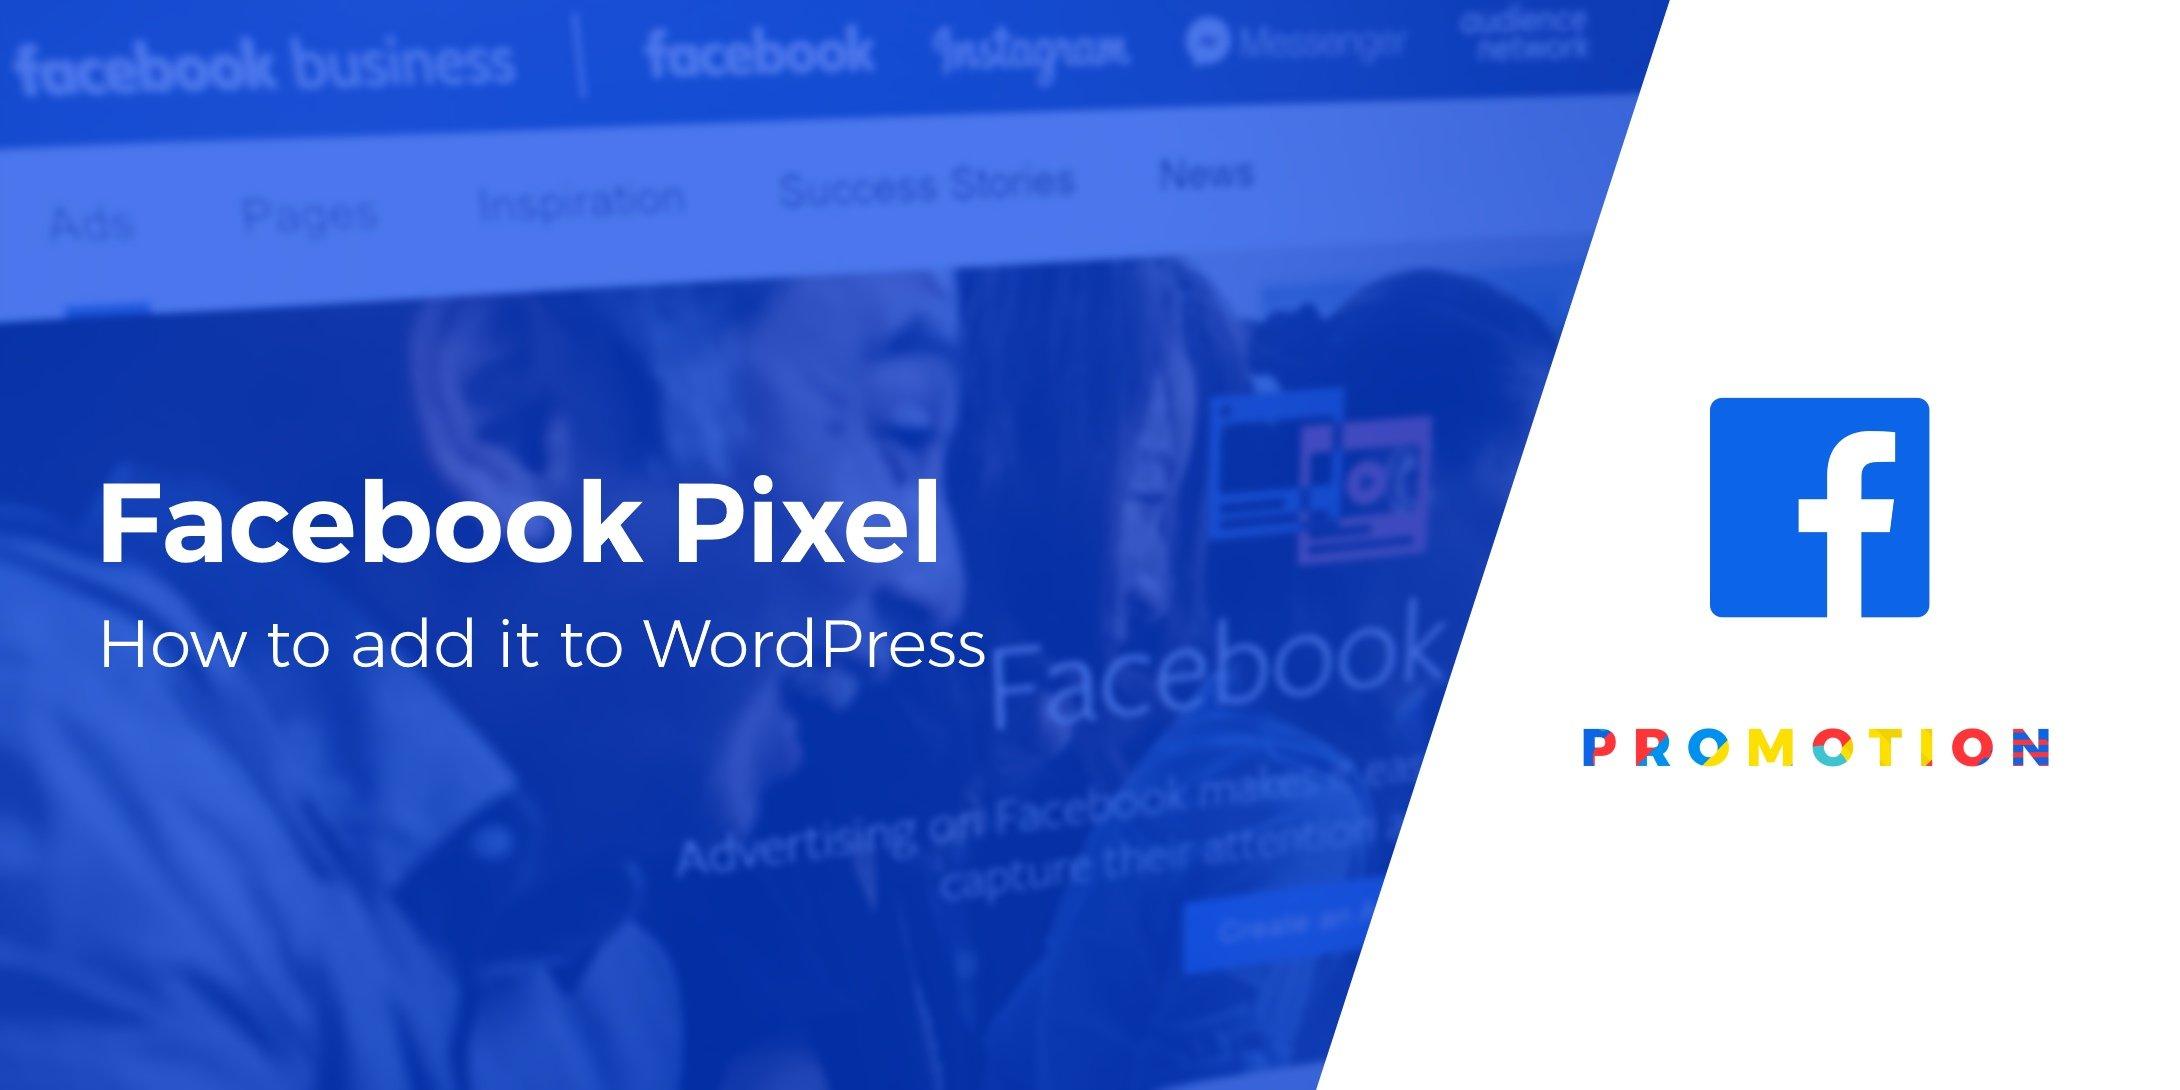 how to add Facebook Pixel to WordPress